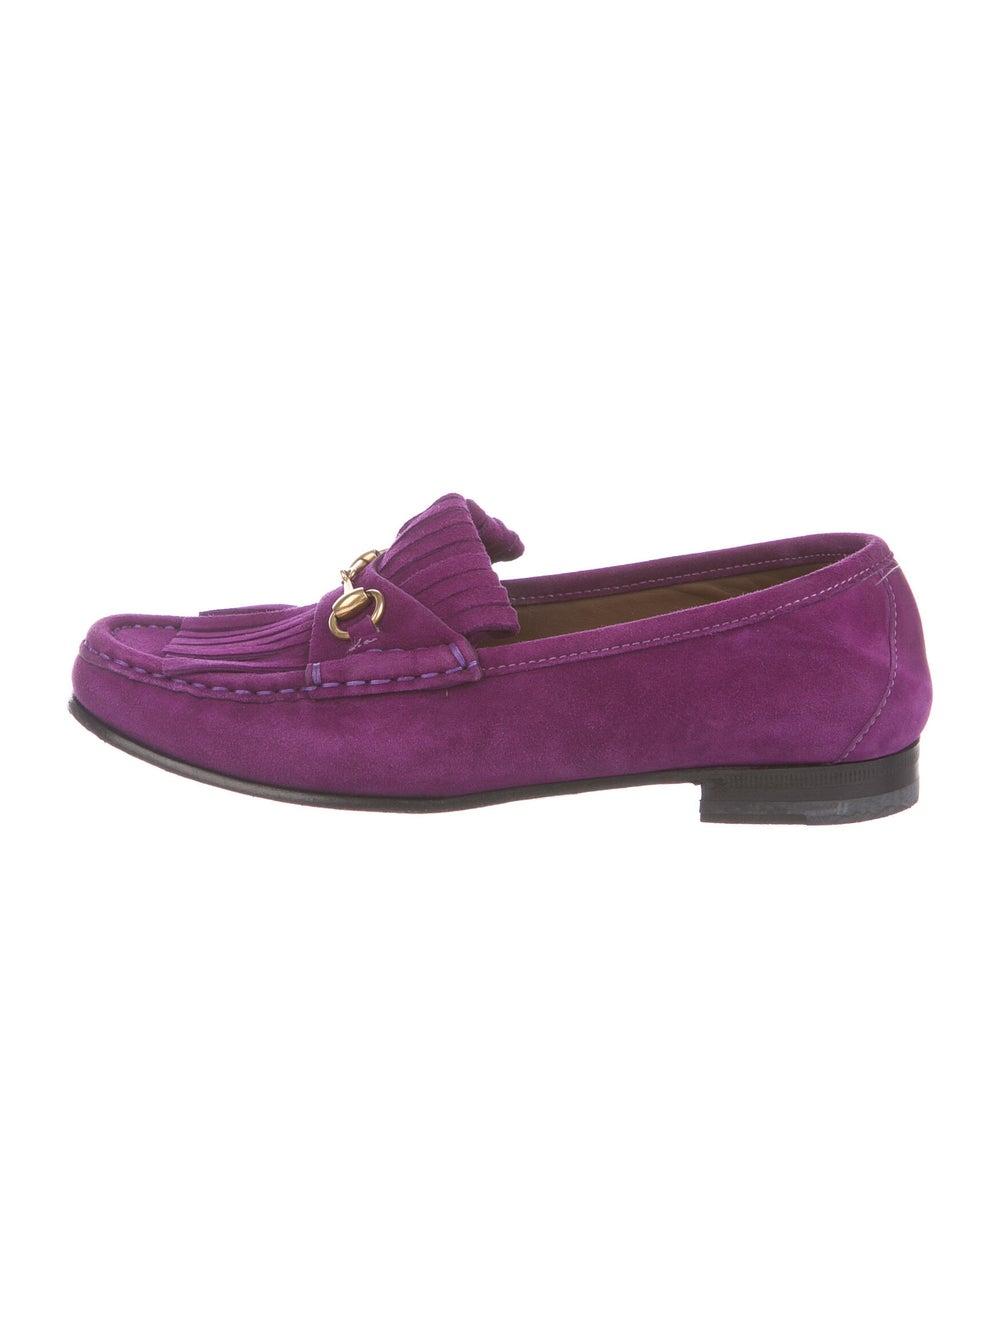 Gucci Horsebit Accent Suede Loafers Purple - image 1